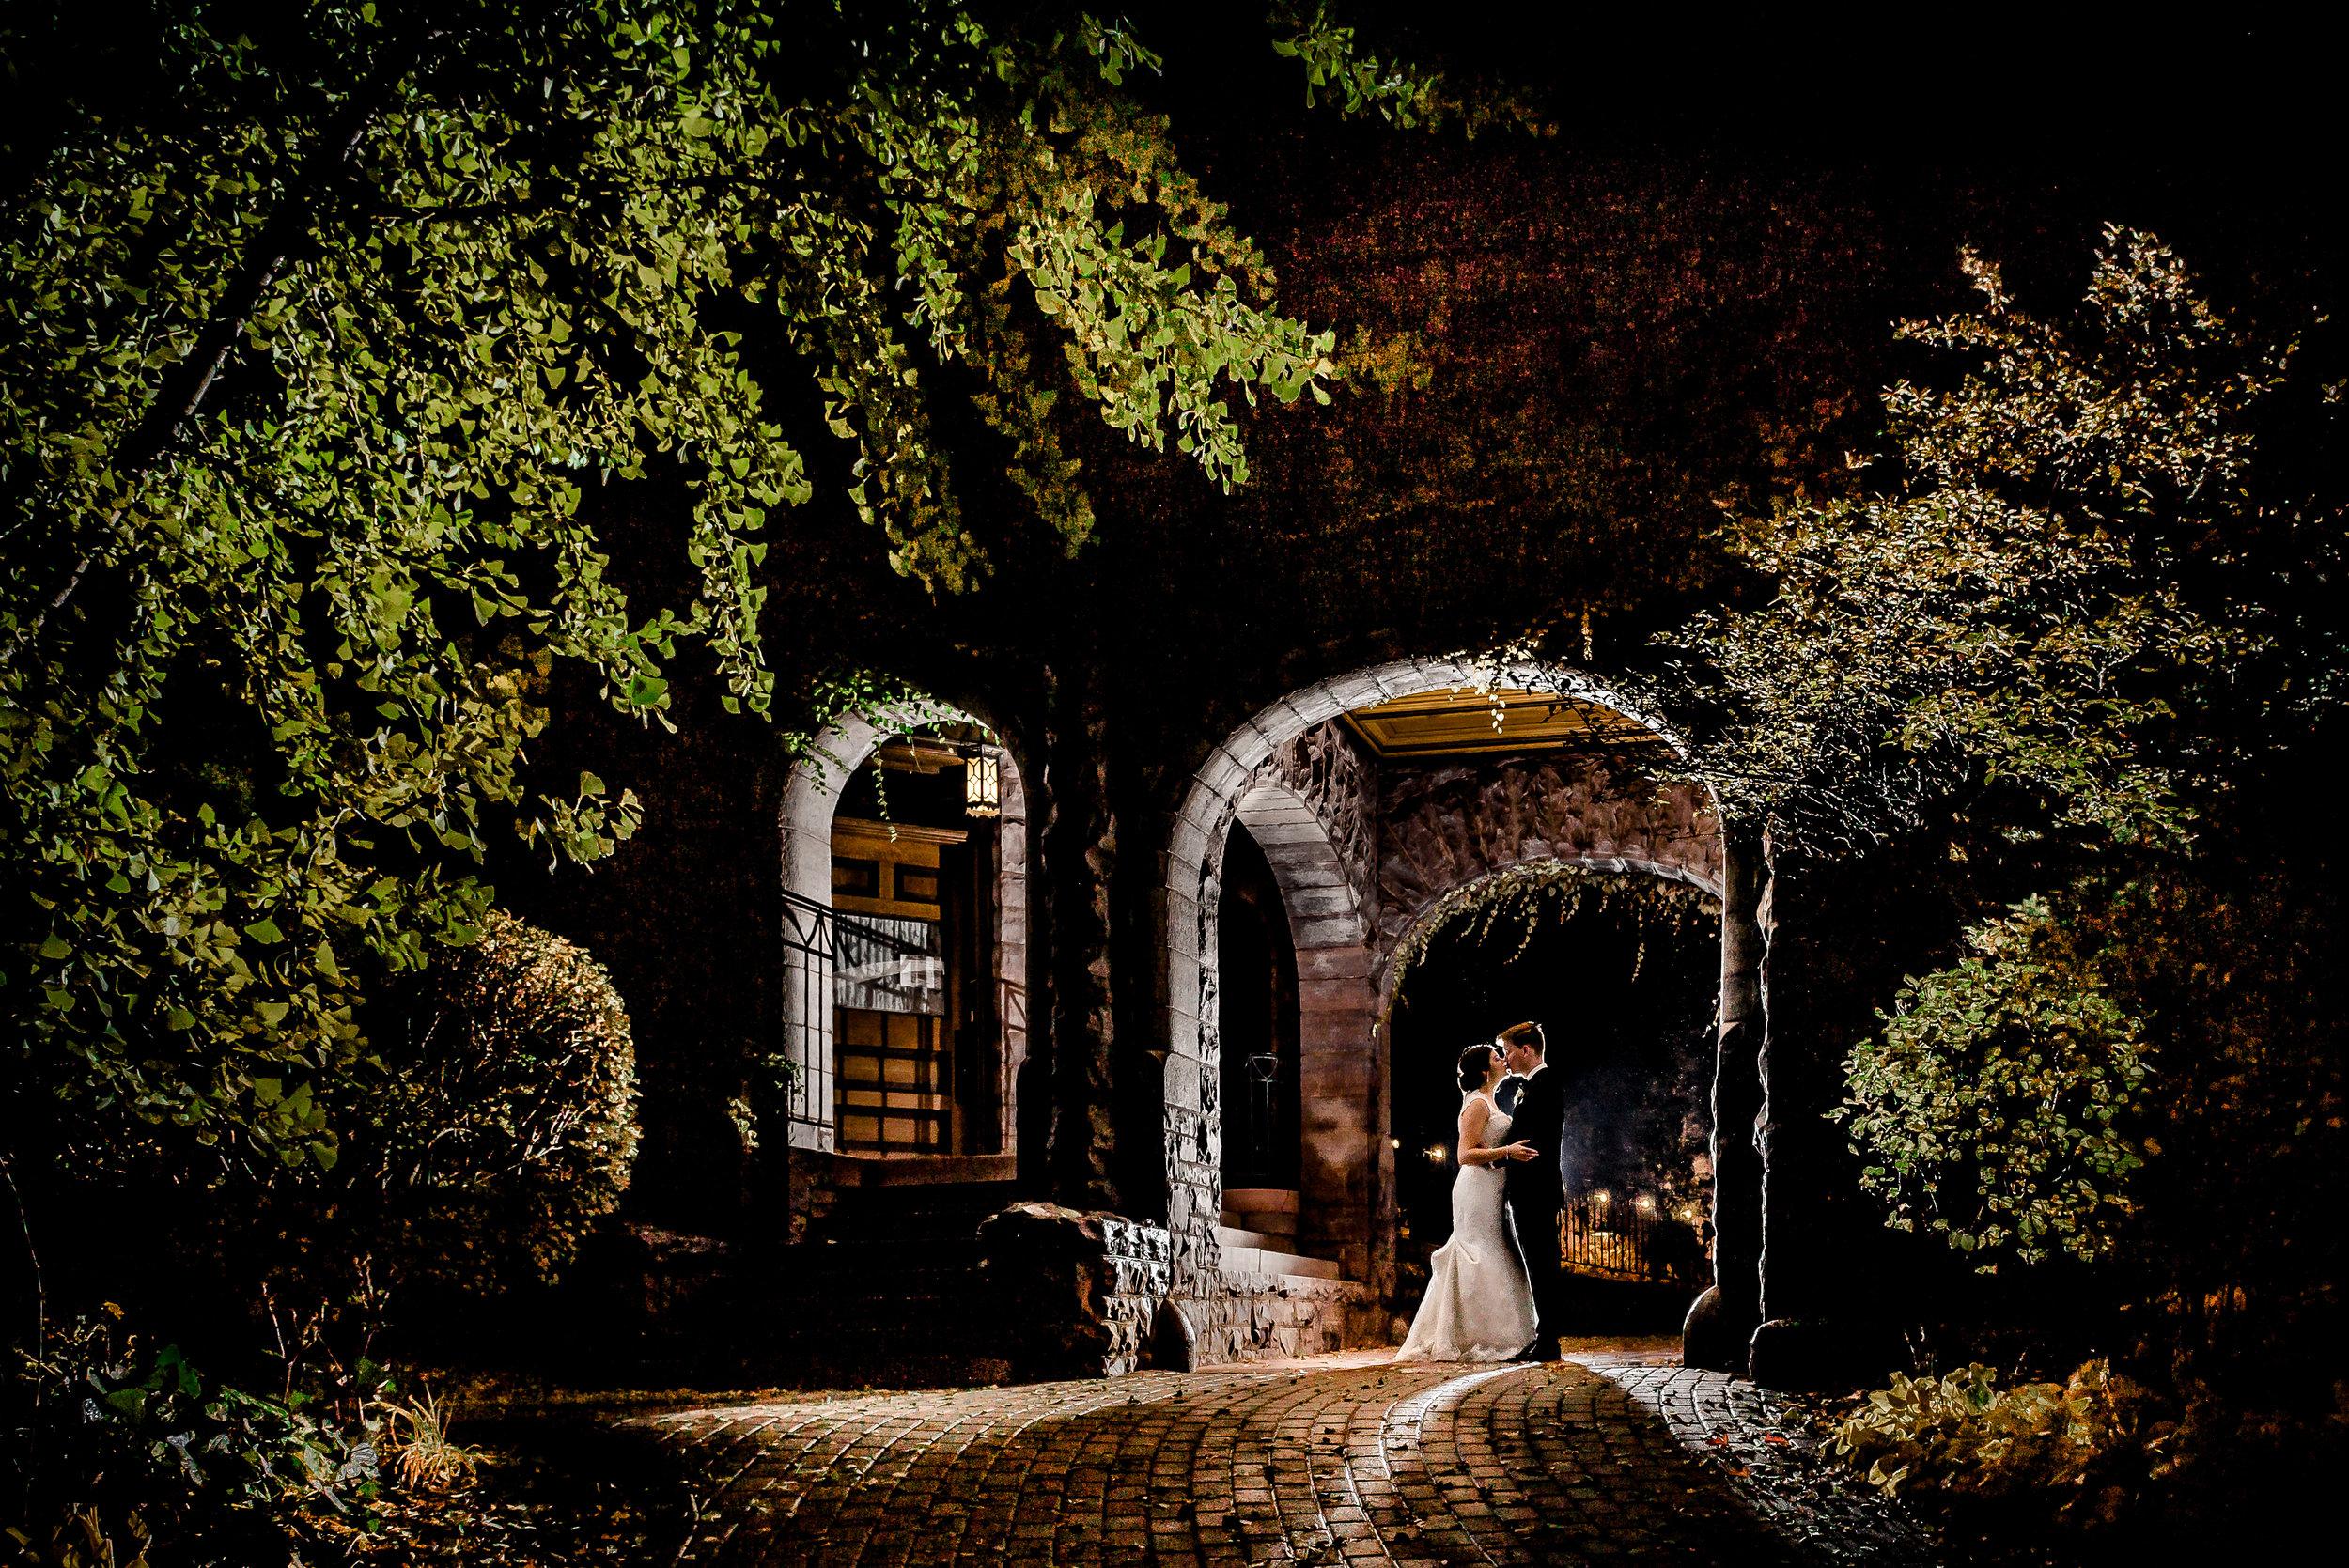 Van Dusen Mansion Luxury Wedding - Romantic Night Portrait with Bride and Groom - Minneapolis Wedding Photographer